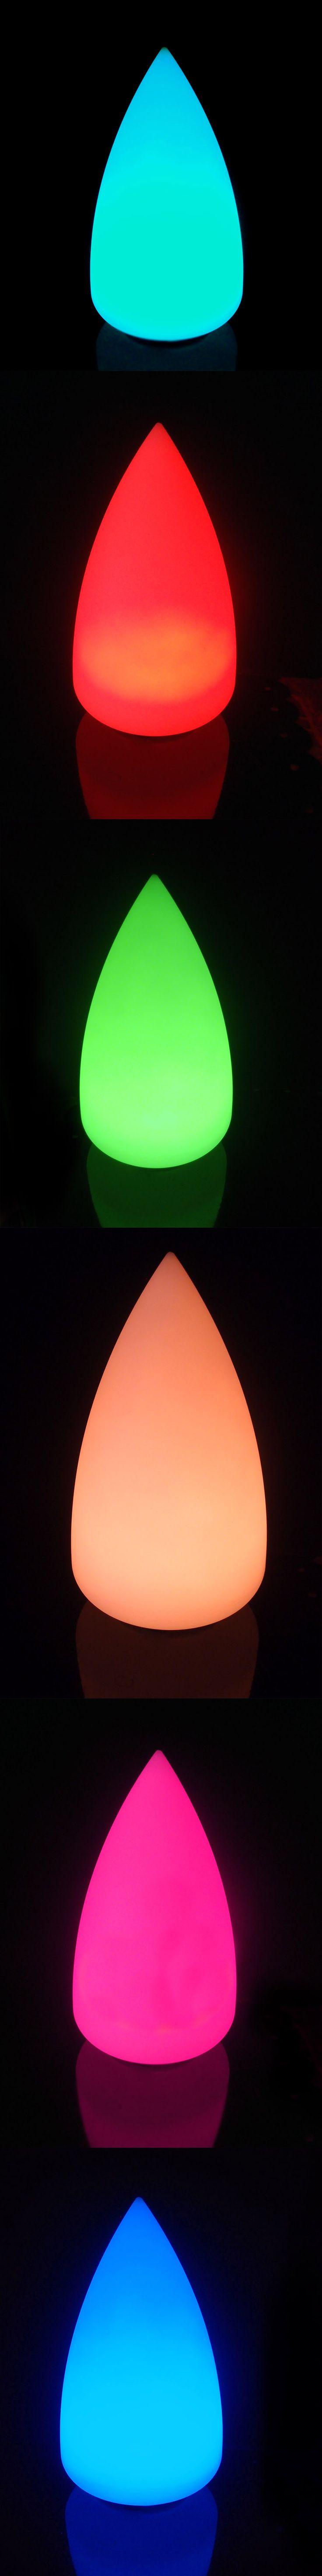 23 best Color Changing LED Orbs images on Pinterest